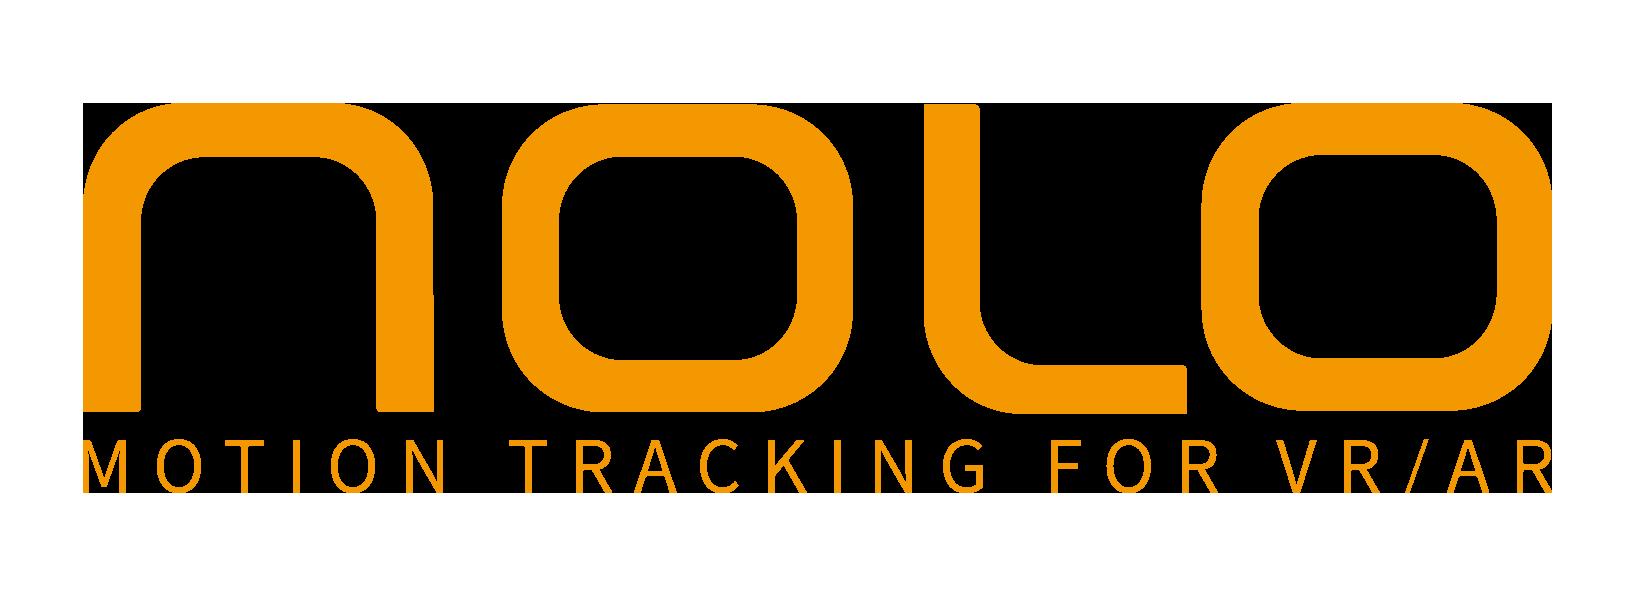 NOLO企业 logo